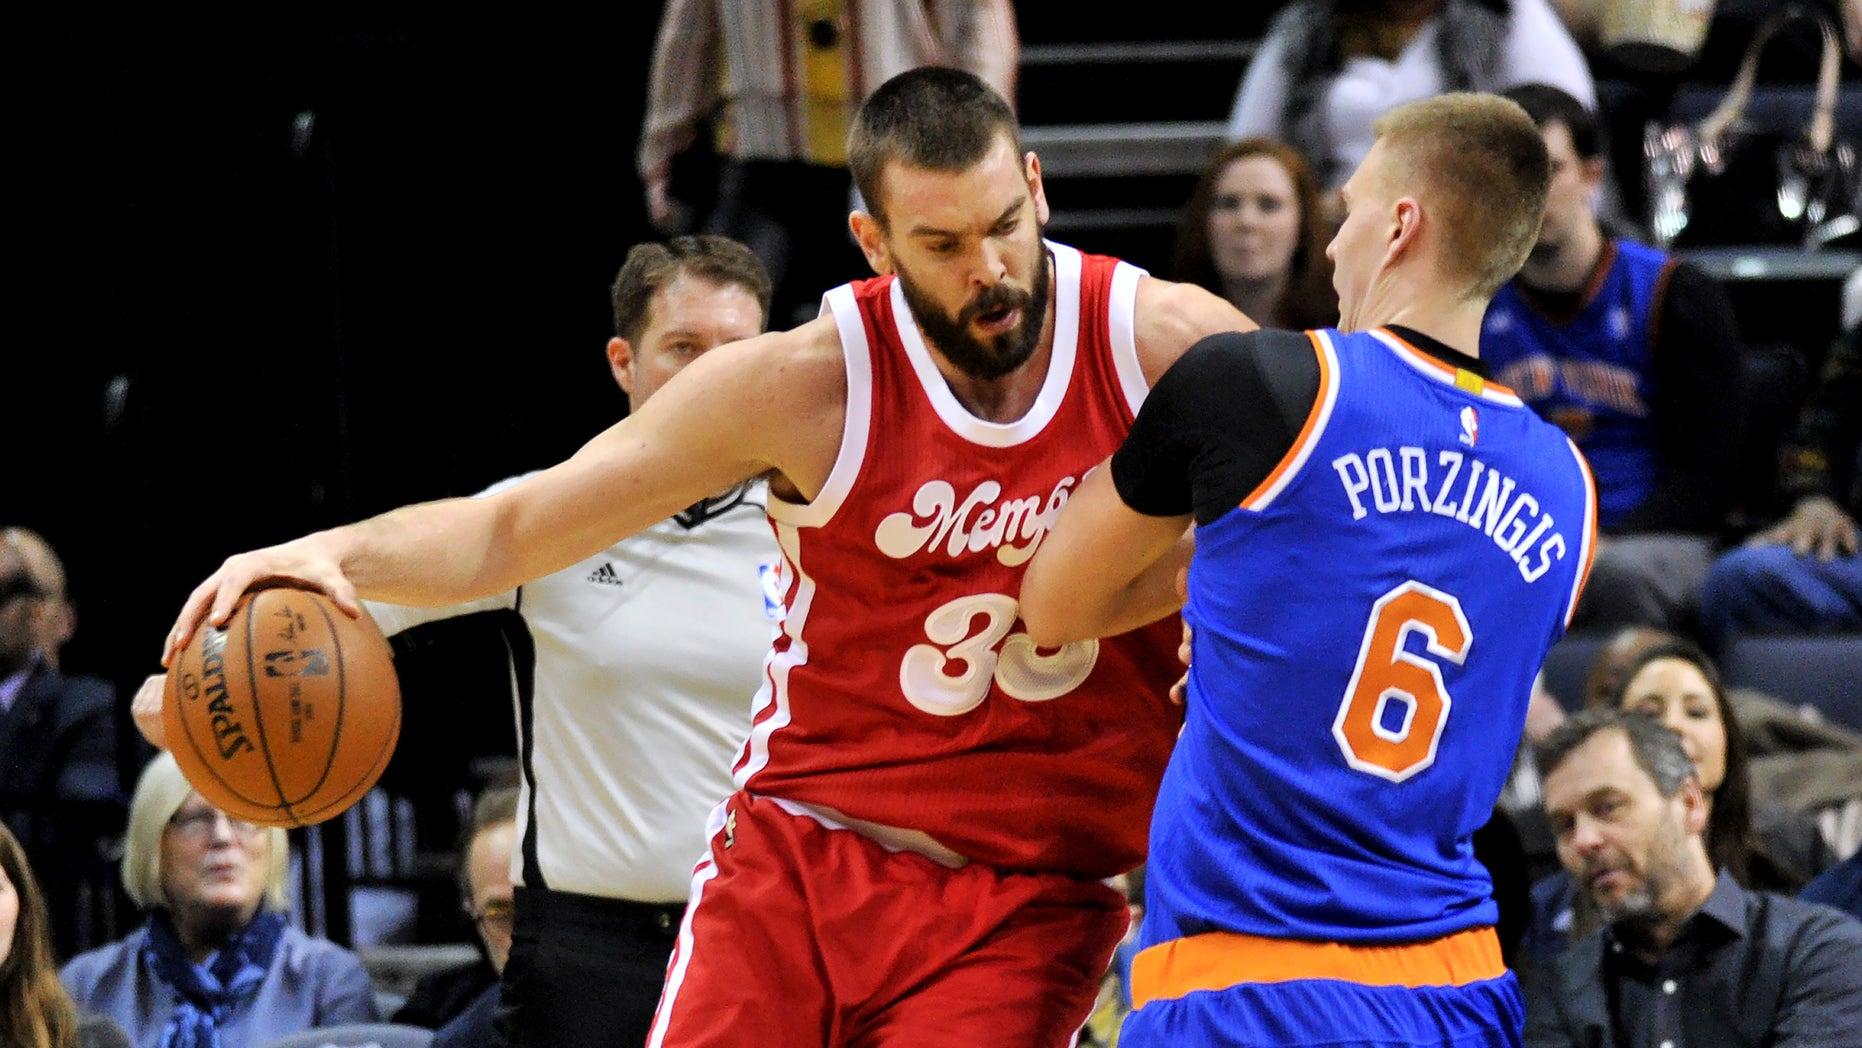 Memphis Grizzlies center Marc Gasol (33) controls the ball against New York Knicks forward Kristaps Porzingis (6) in the first half of an NBA basketball game Saturday, Jan. 16, 2016, in Memphis, Tenn. (AP Photo/Brandon Dill)